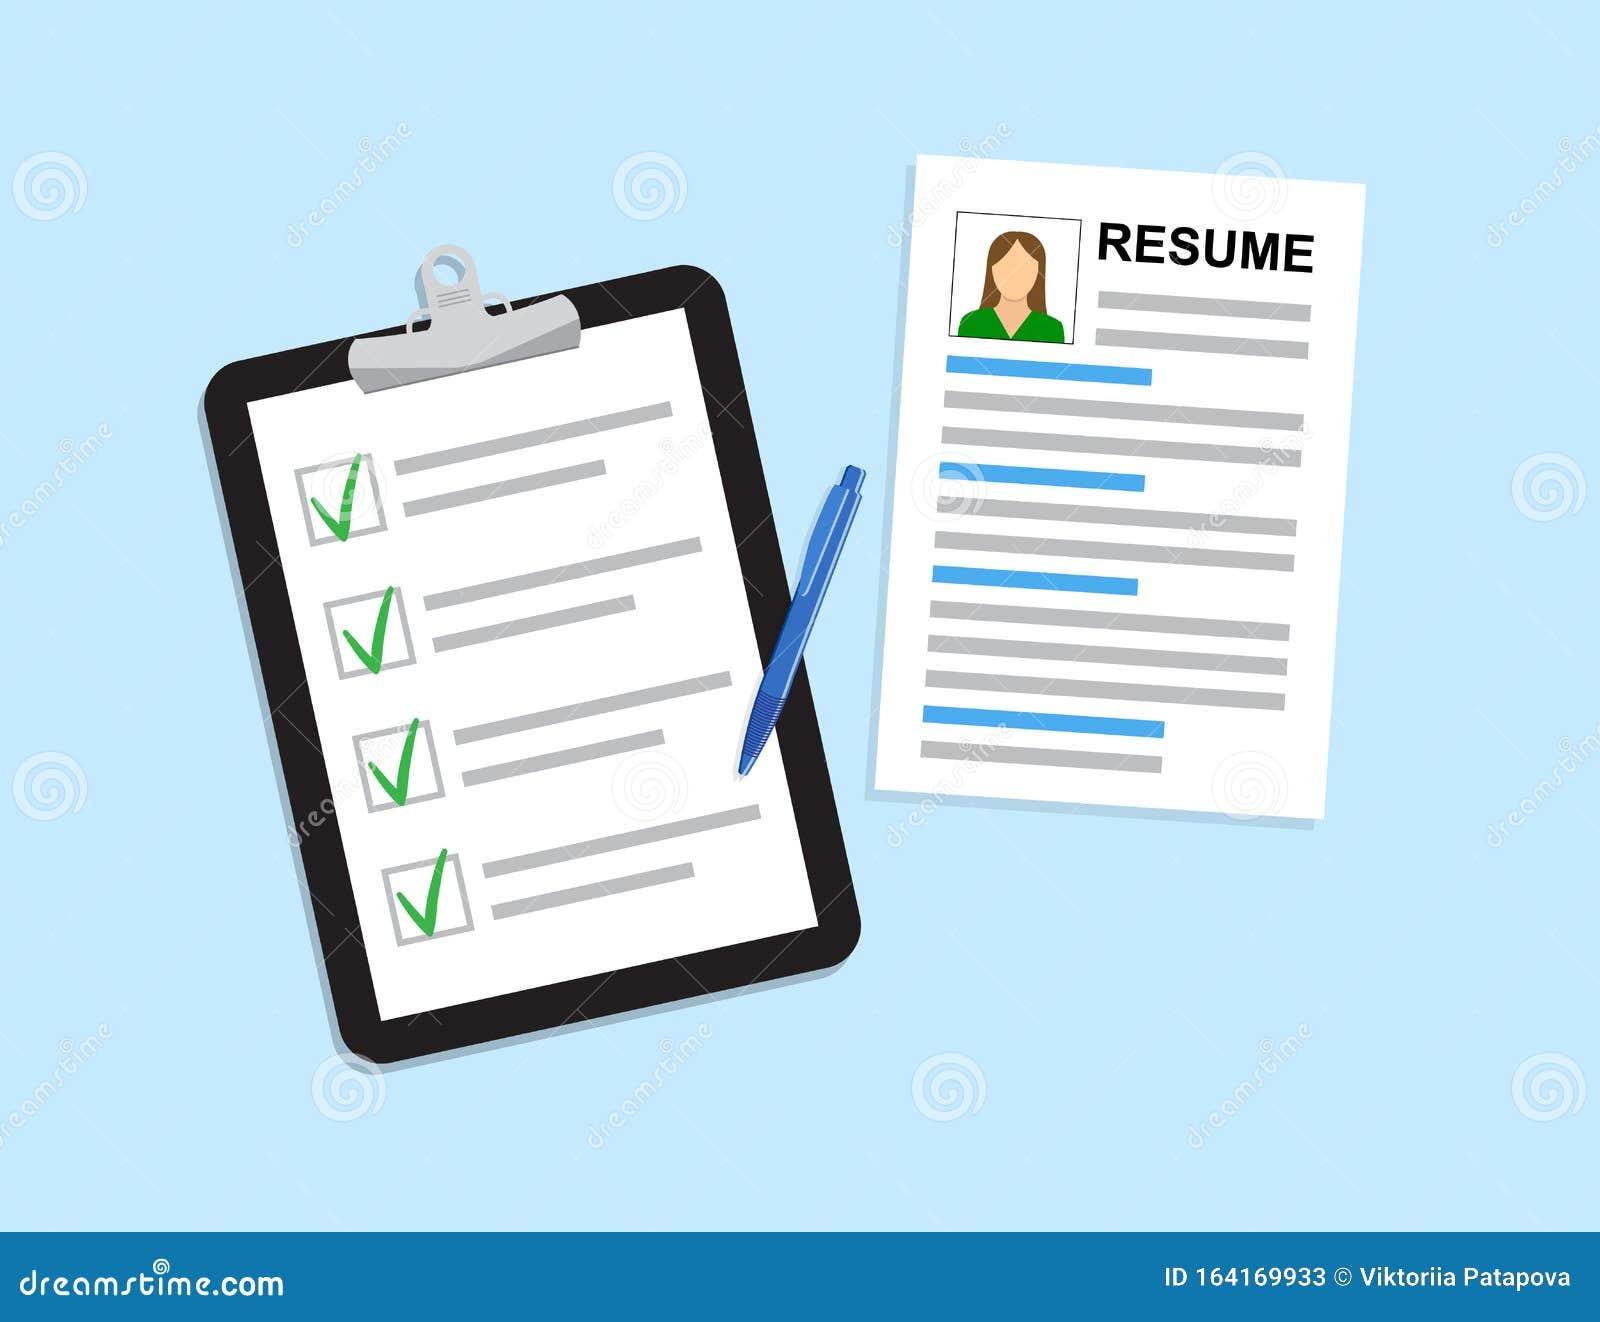 Resumes Cv Curriculum Vitae Application Selecting Staff